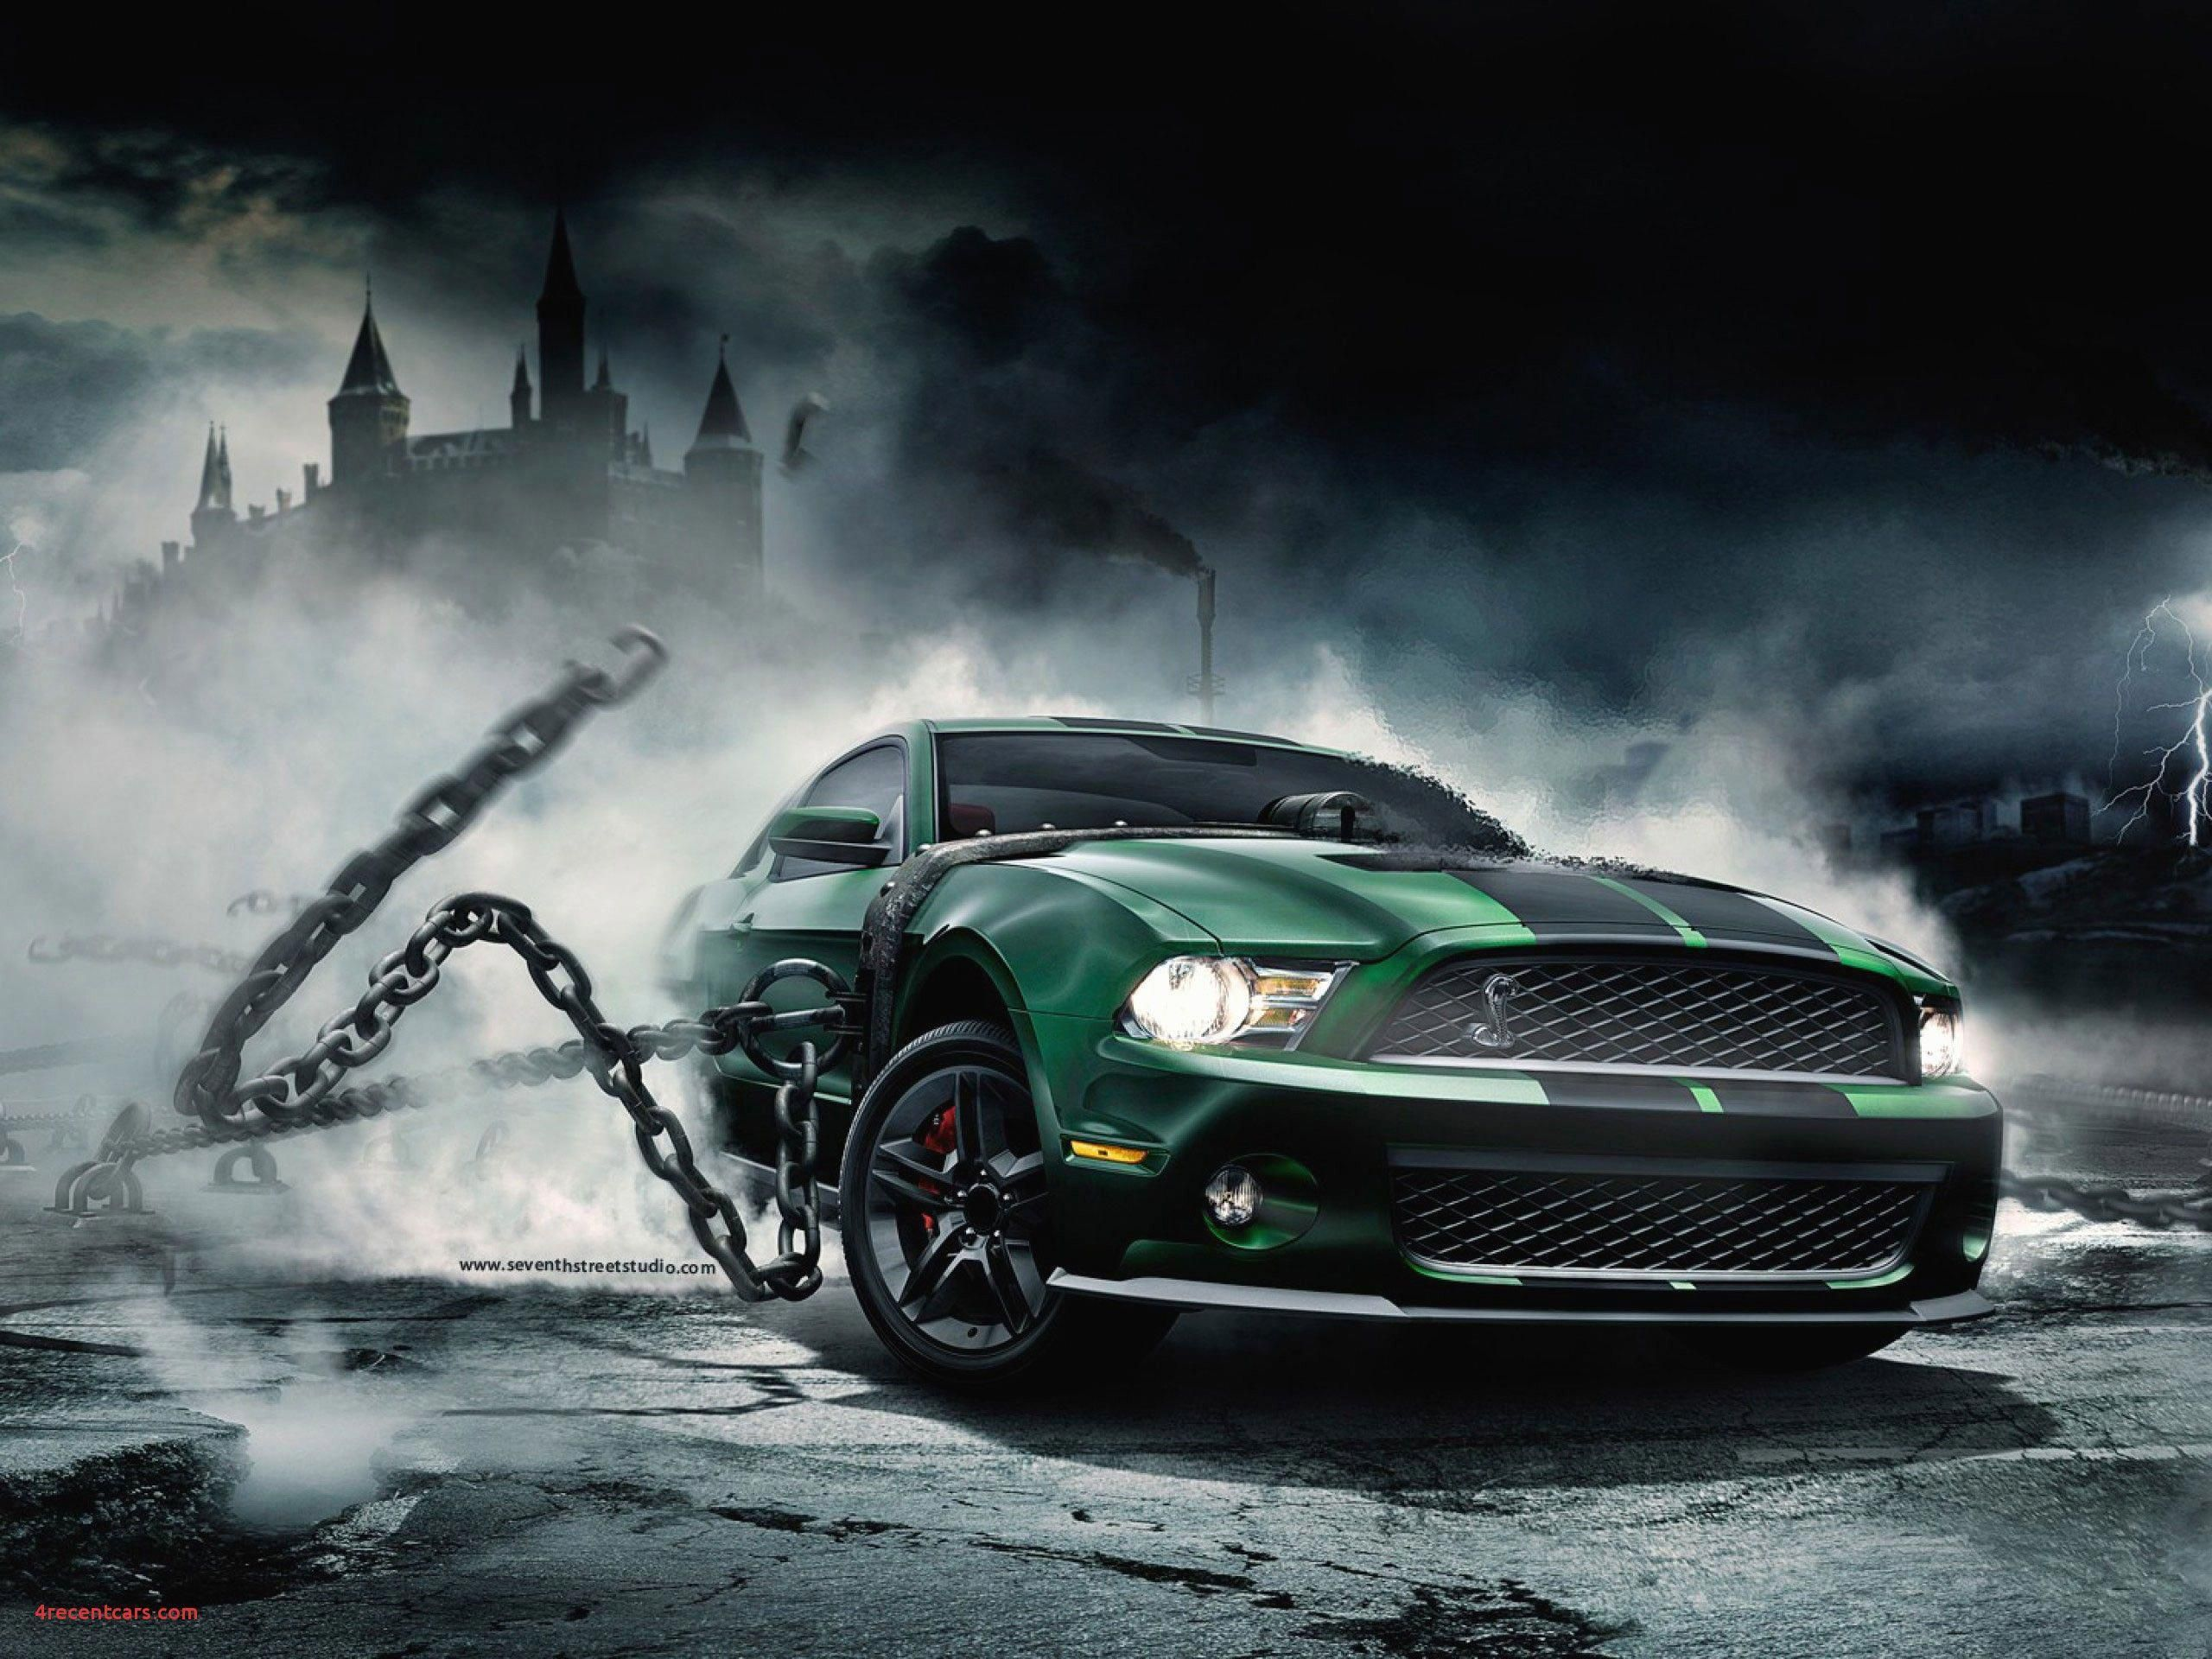 Best Hd Wallpapers Cool Cars 3d Hd Pics Mojmalnews Com Of Cars Hd